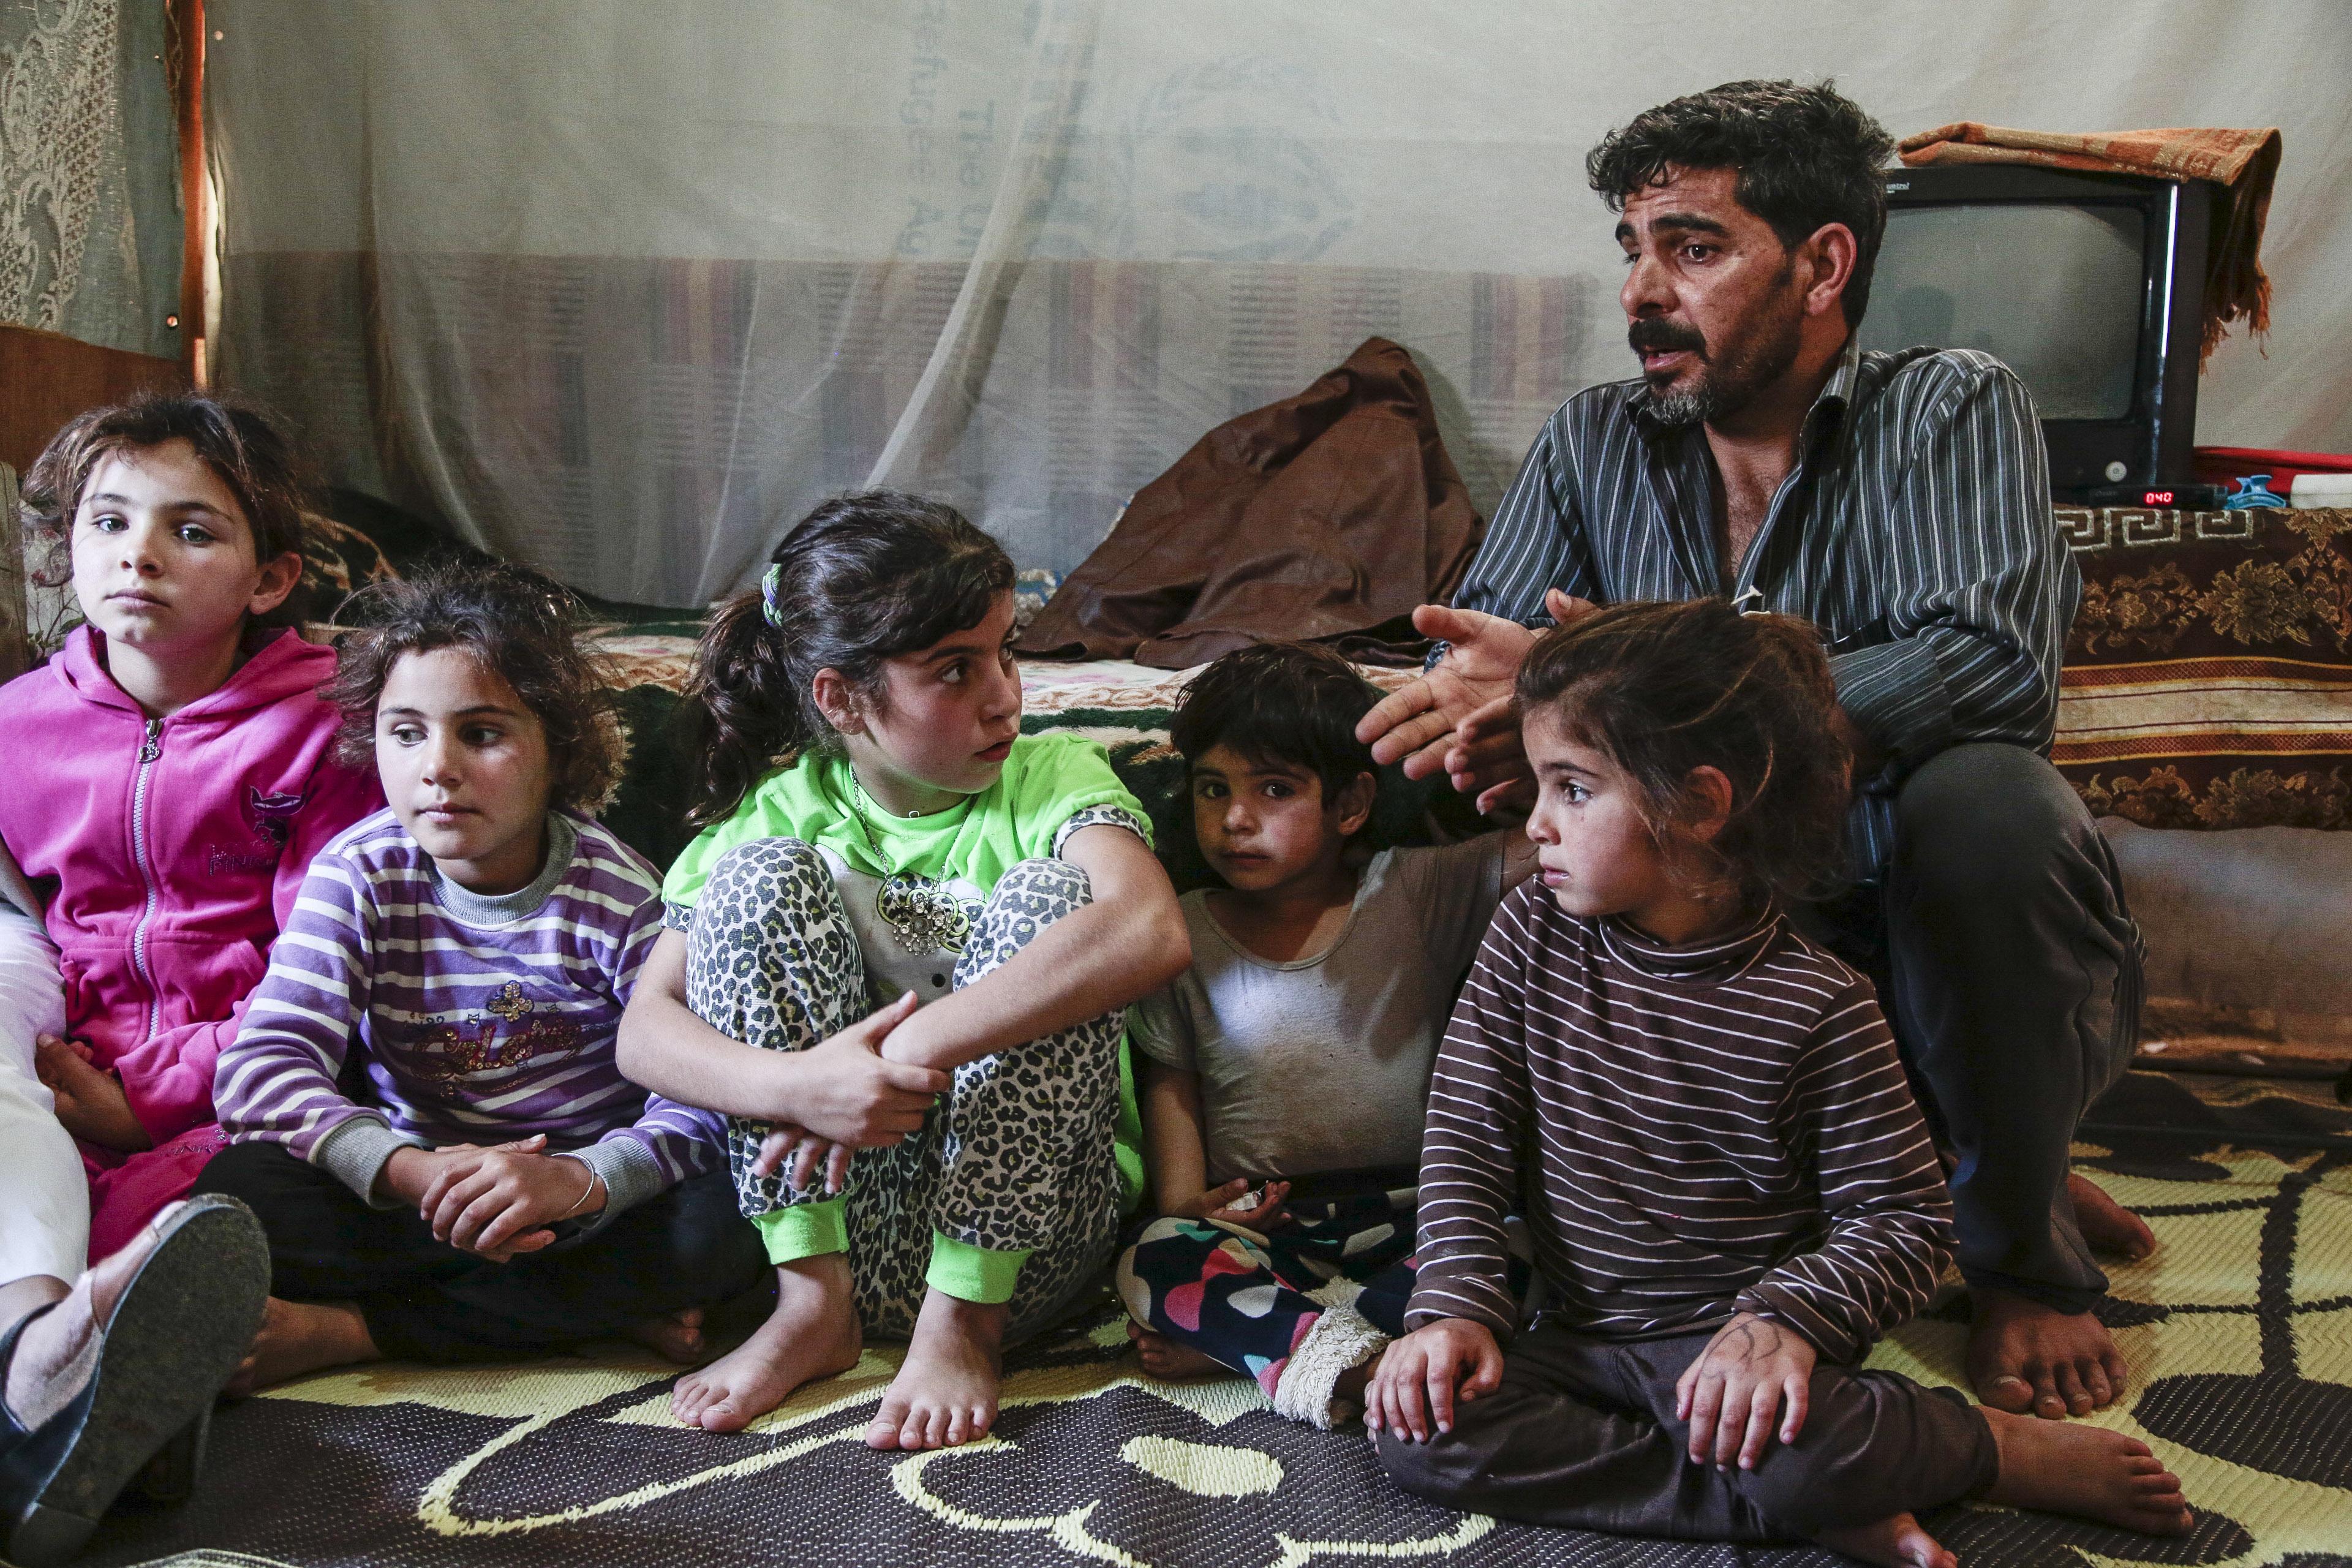 syrien hilfe ist dringend aktion deutschland hilft. Black Bedroom Furniture Sets. Home Design Ideas